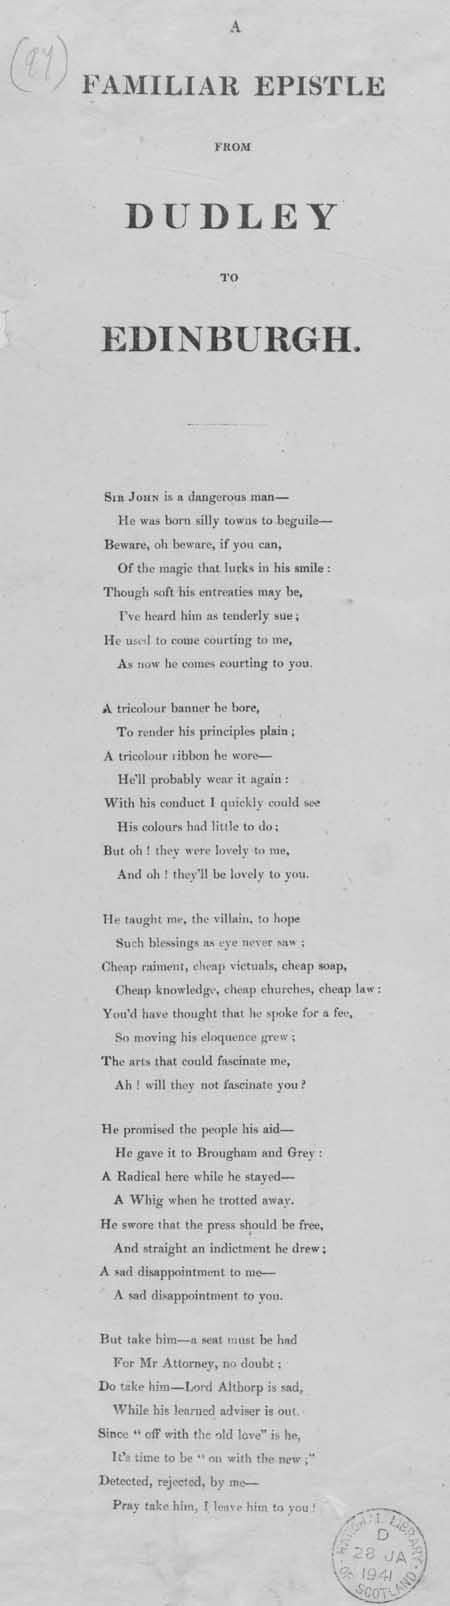 Broadside ballad entitled 'A Familiar Epistle from Dudley to Edinburgh'